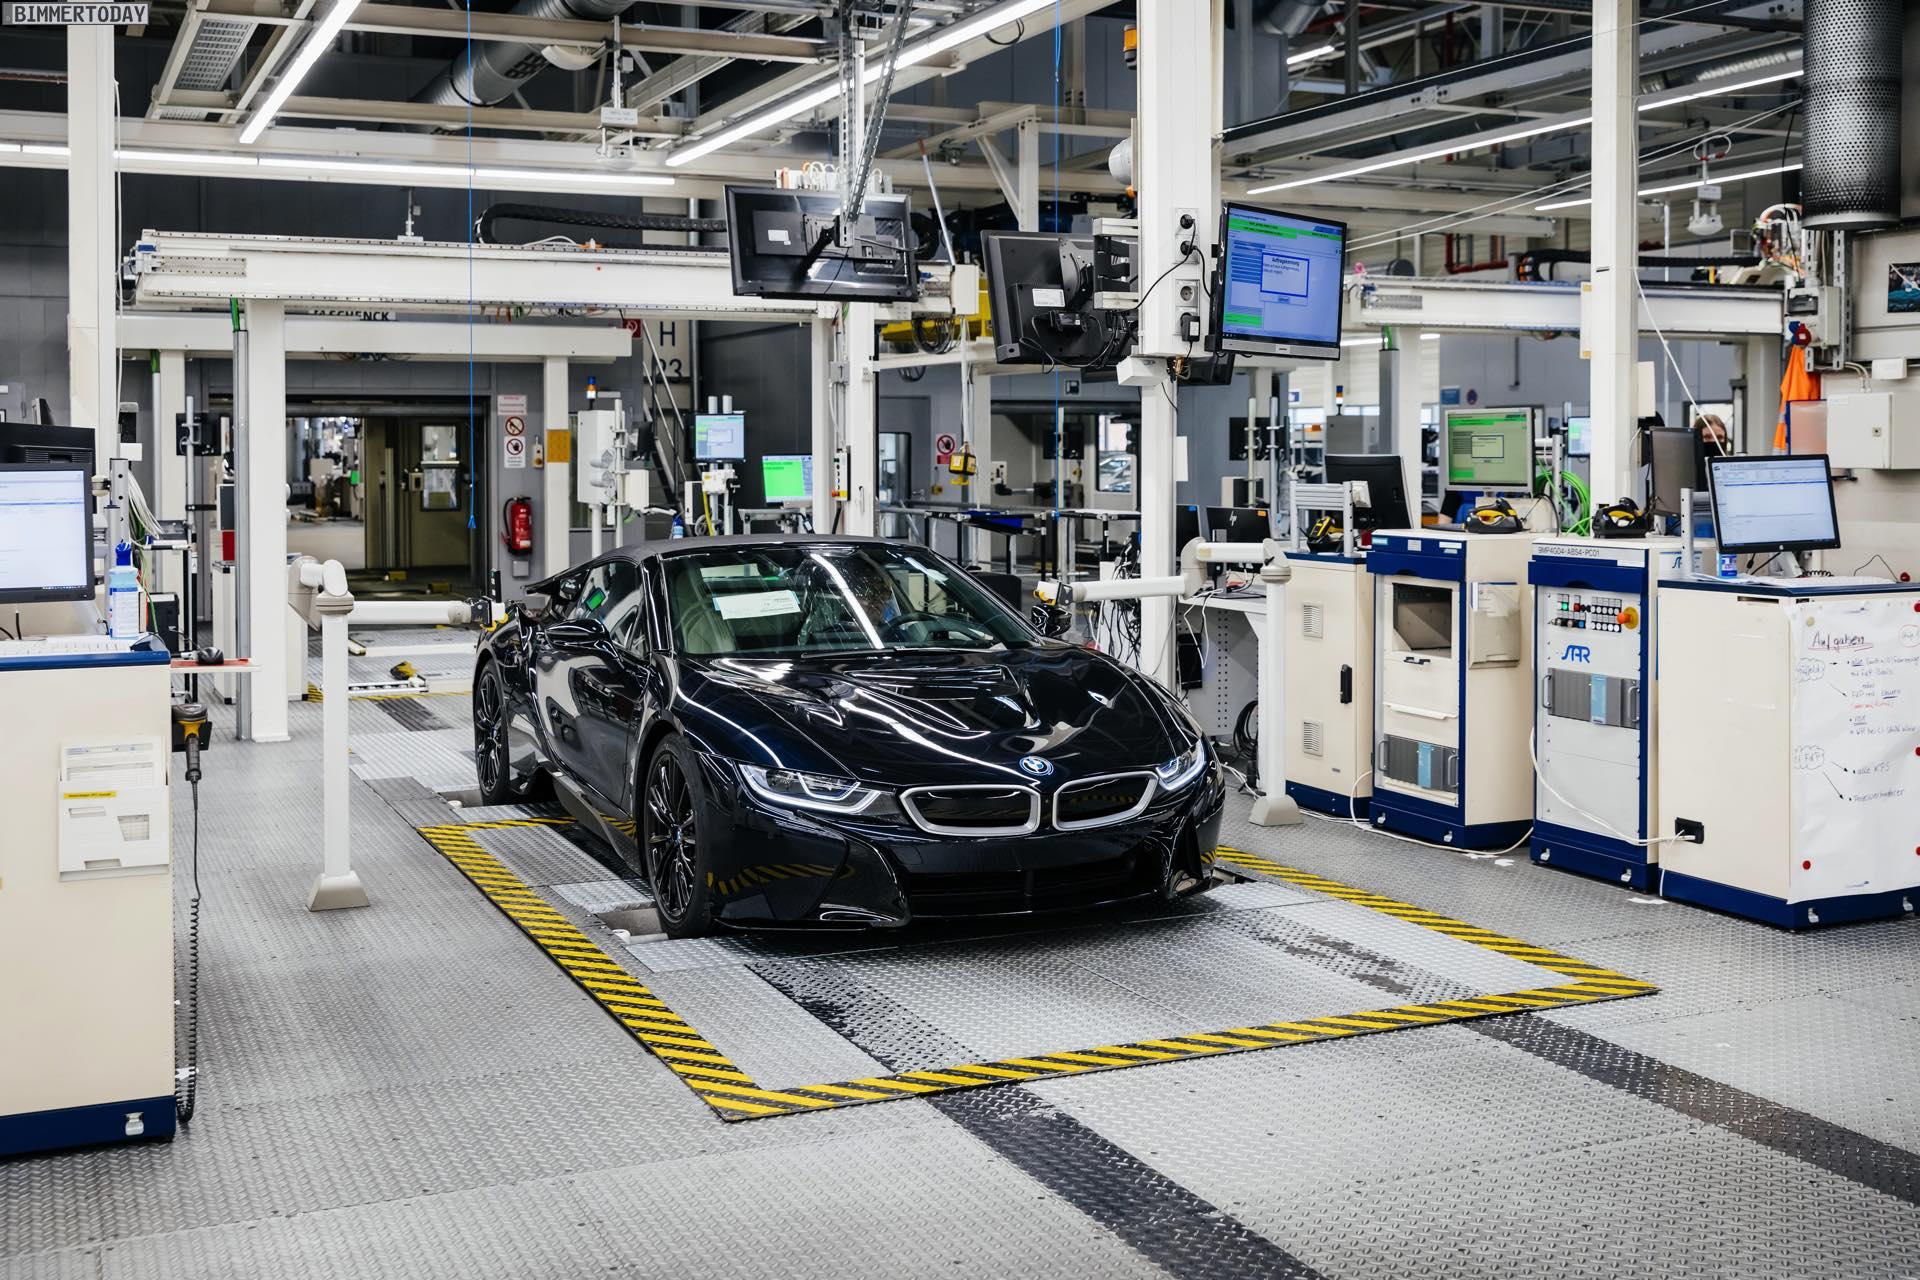 2013 - [BMW] i8 [i12] - Page 23 BMW-i8-Finale-Werk-Leipzig-Individual-Roadster-Produktion-29